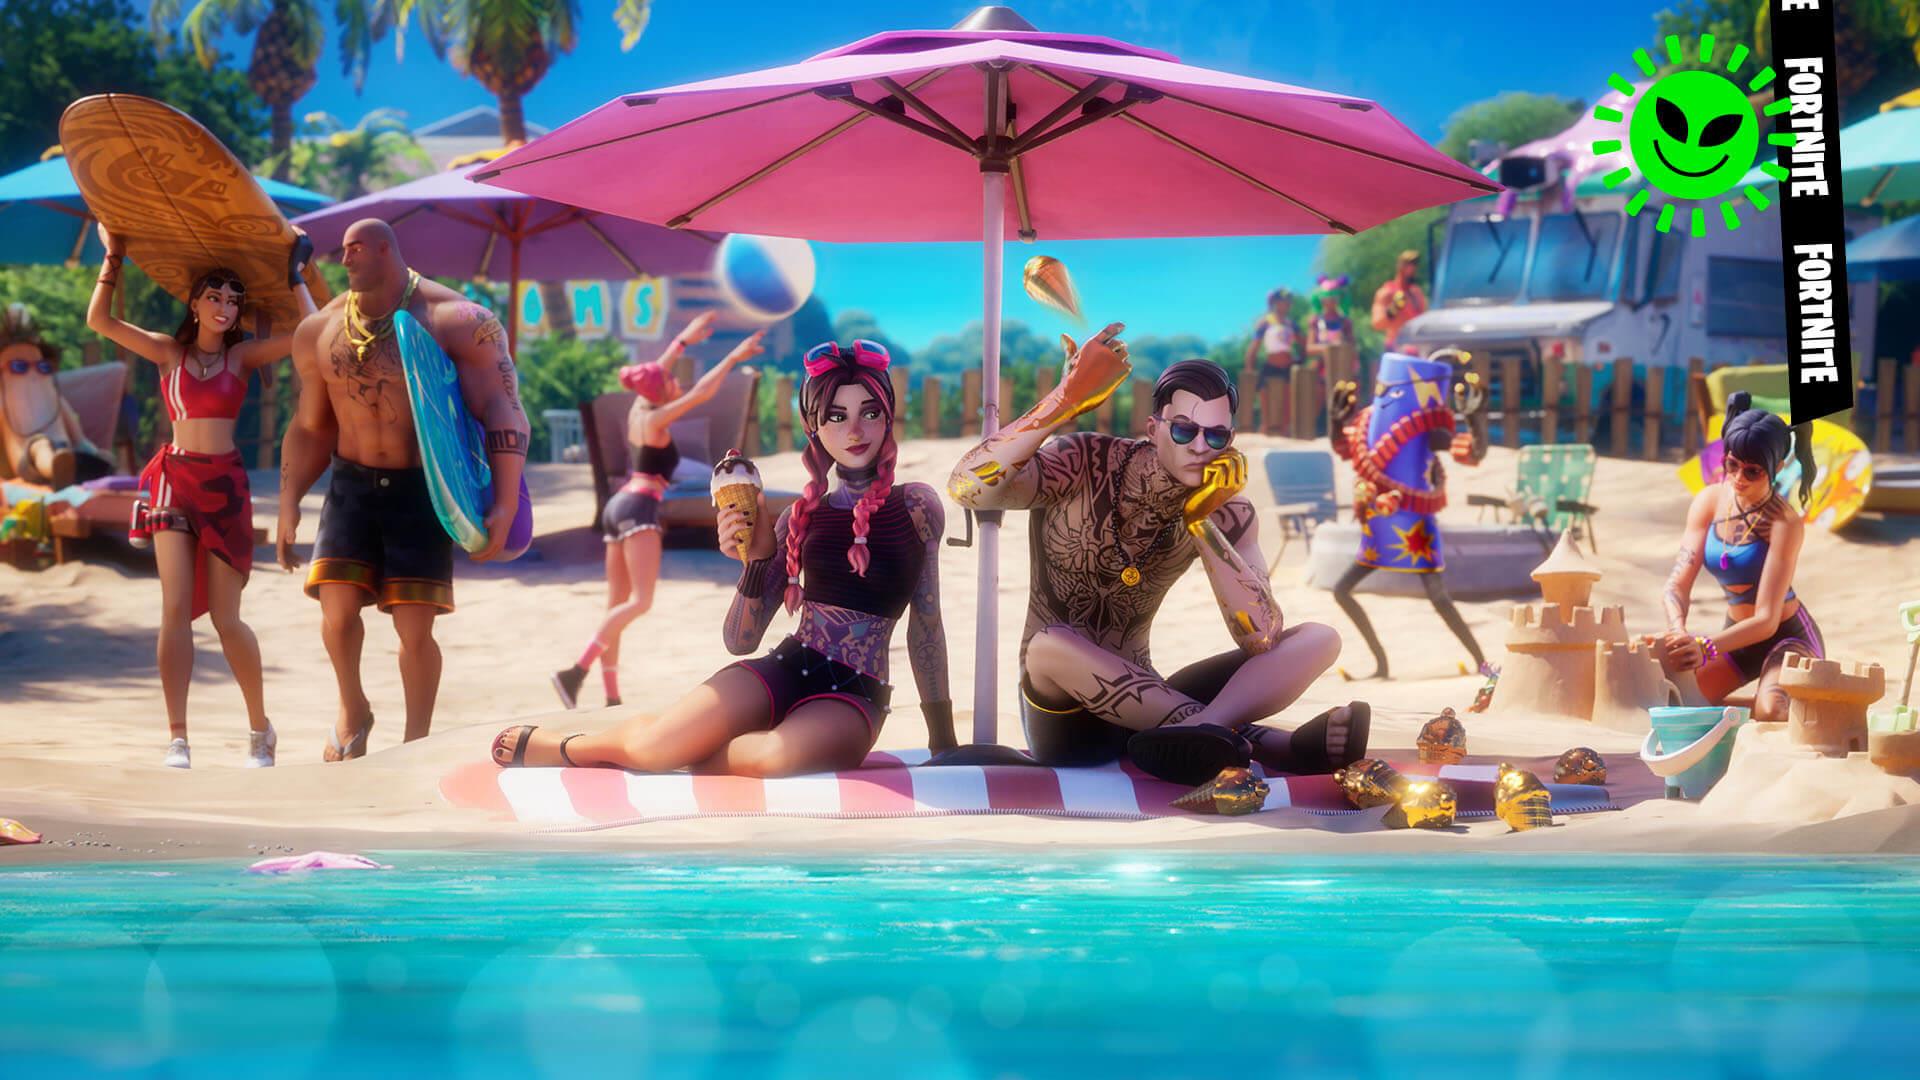 Fortnite Beach Brutus, Beach Jules, Midsummer Midas, and Scuba Crystal